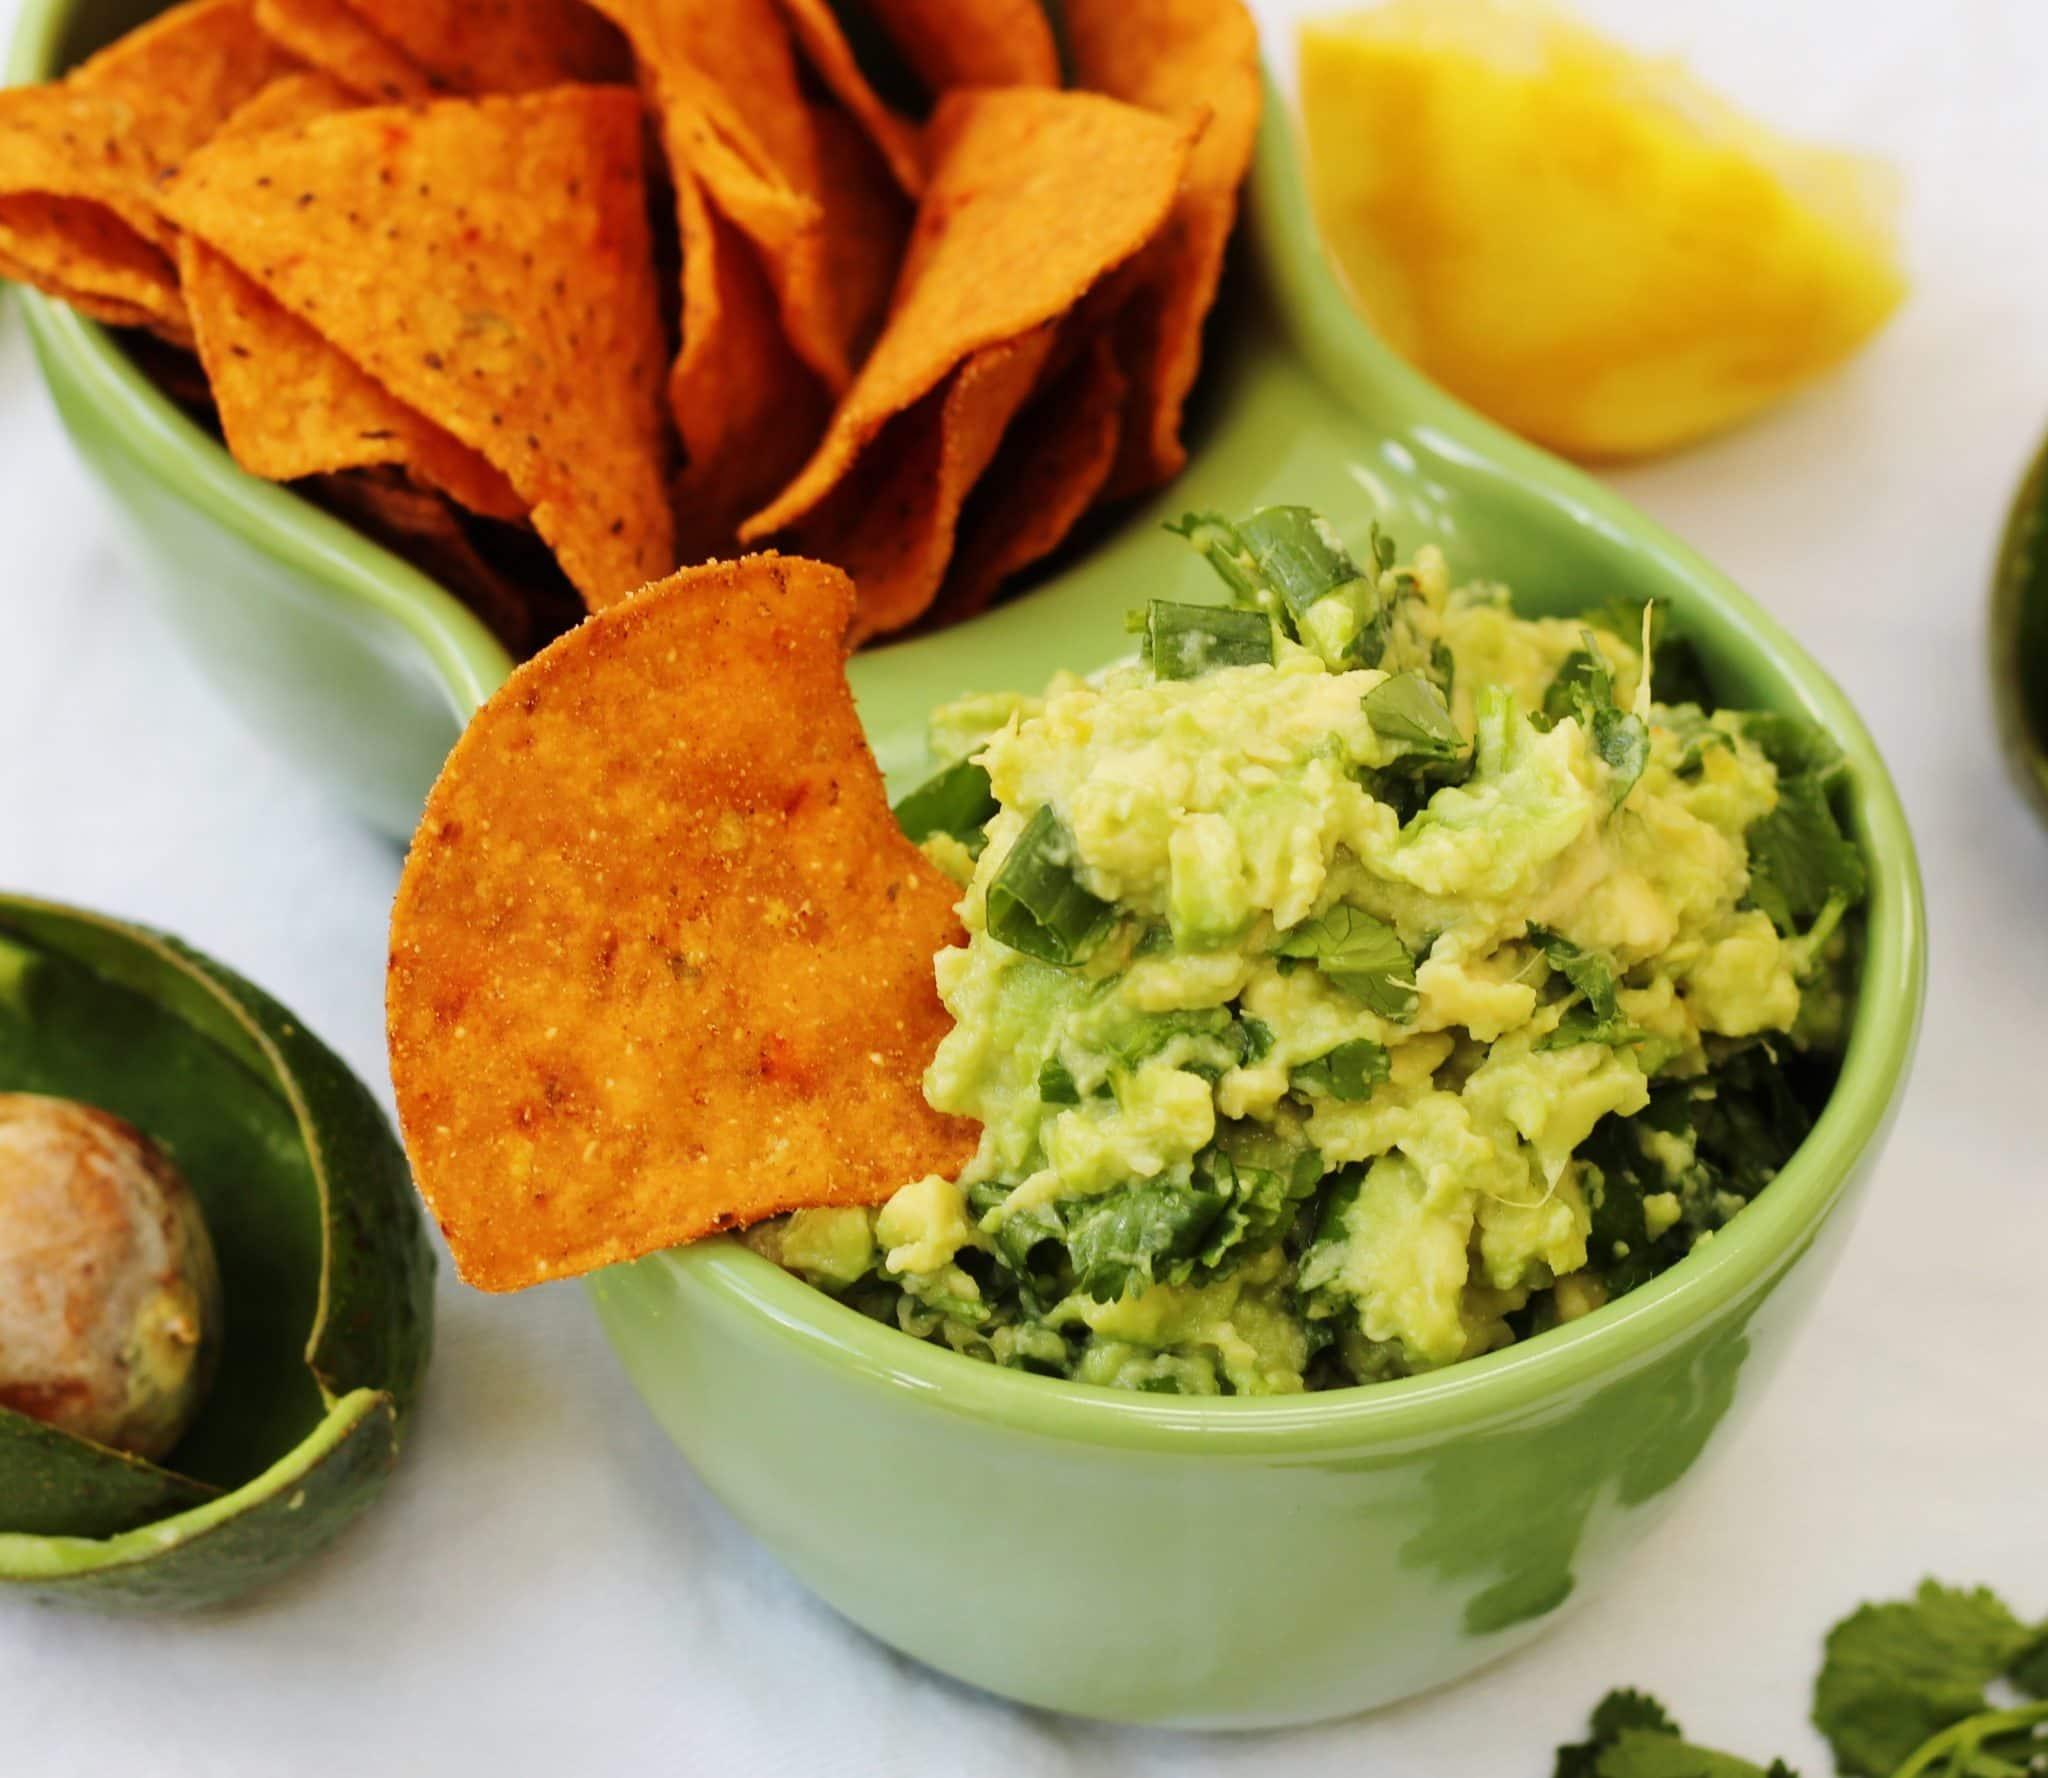 lemon and herb guacamole